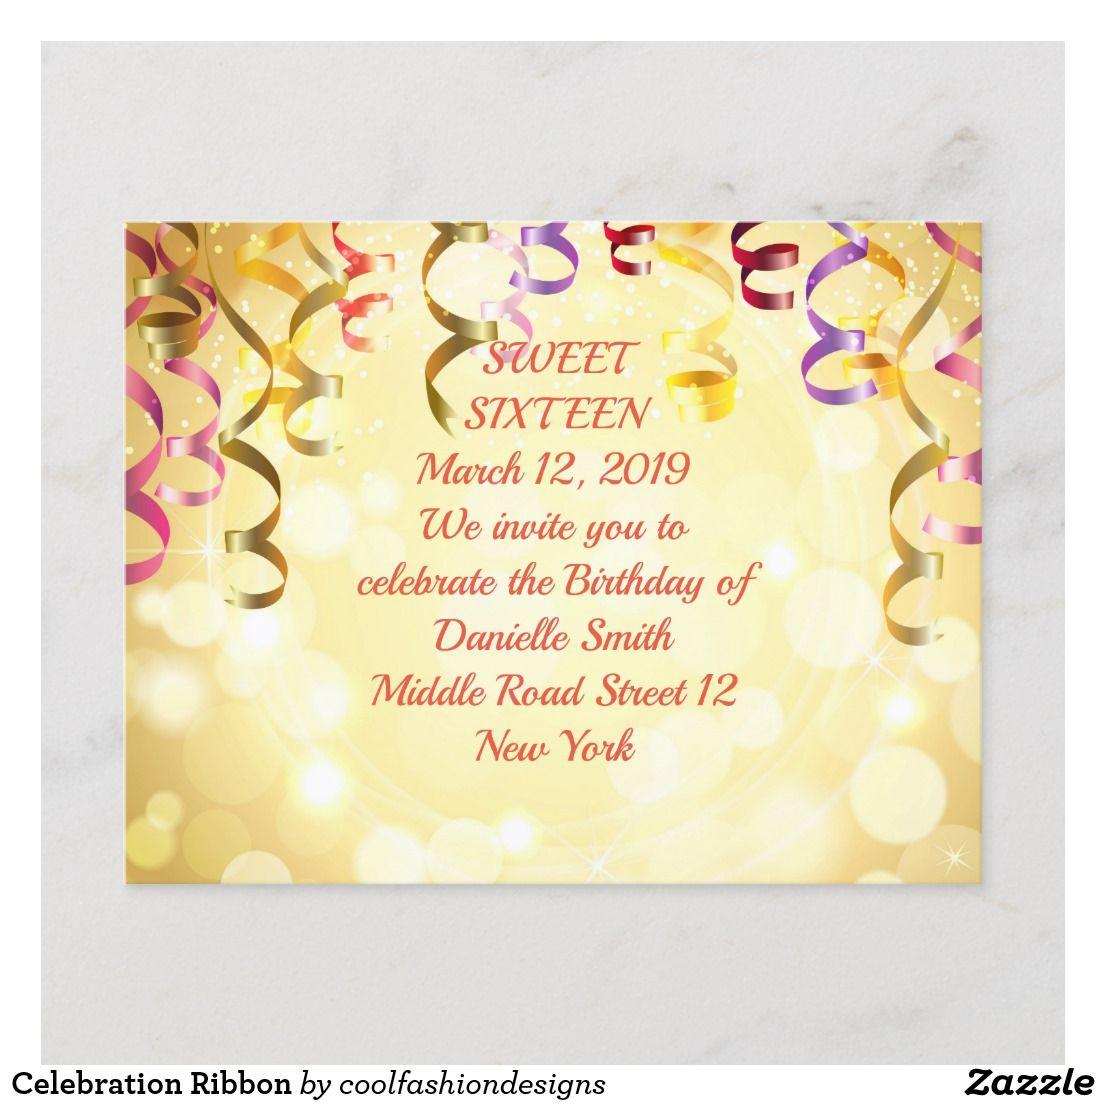 Celebration Ribbon Announcement Postcard | Zazzle com